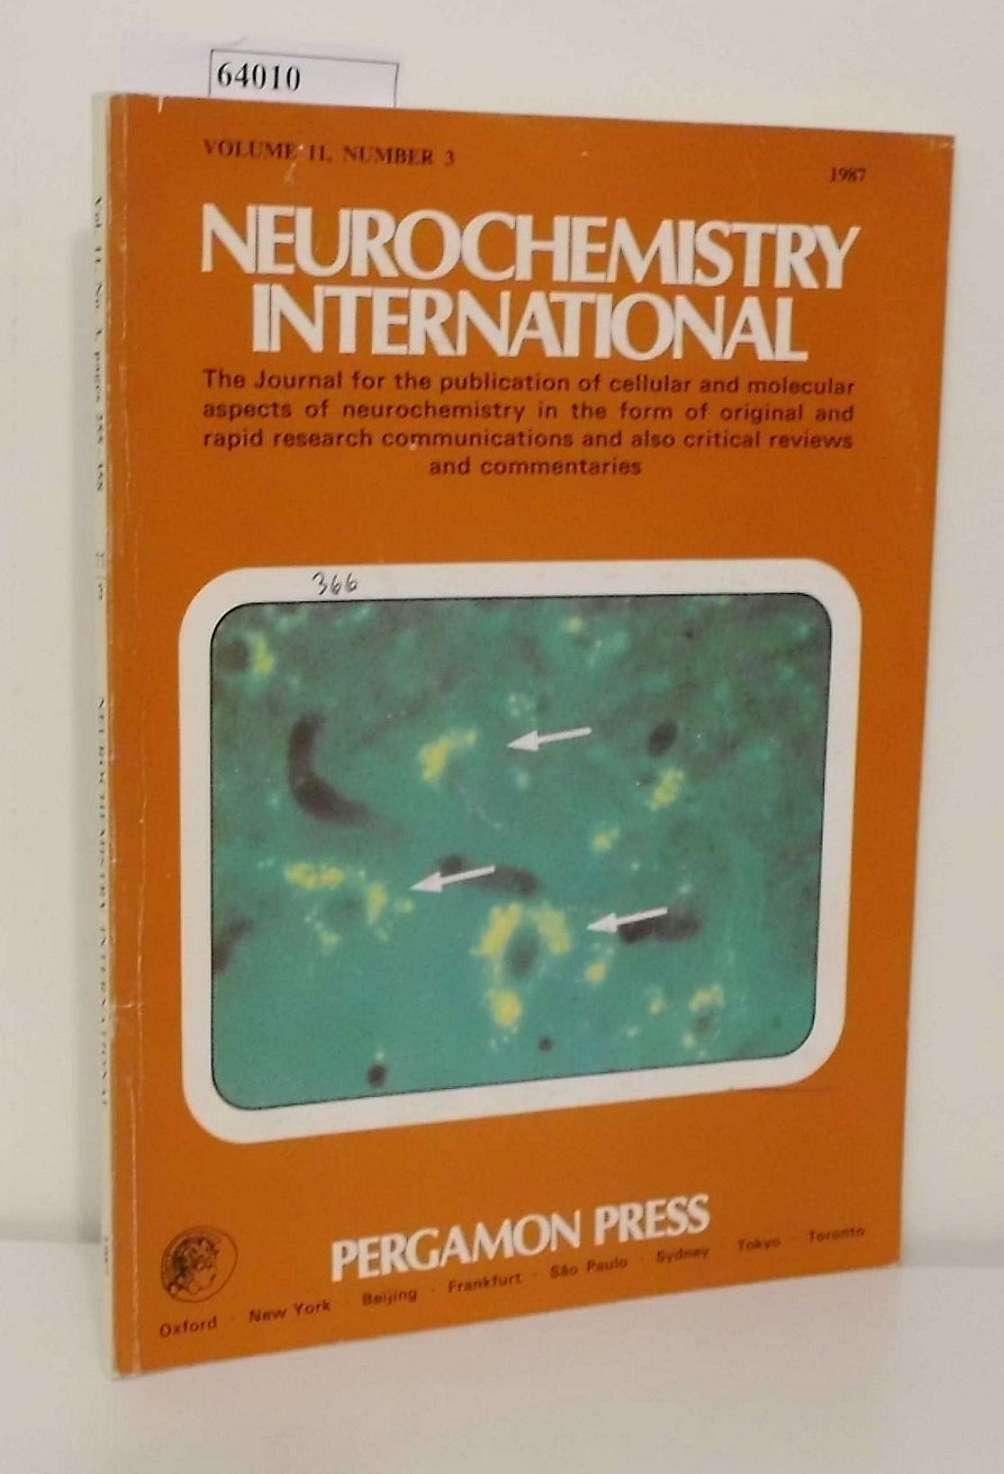 Neurochemistry International Vol. 11, No. 3